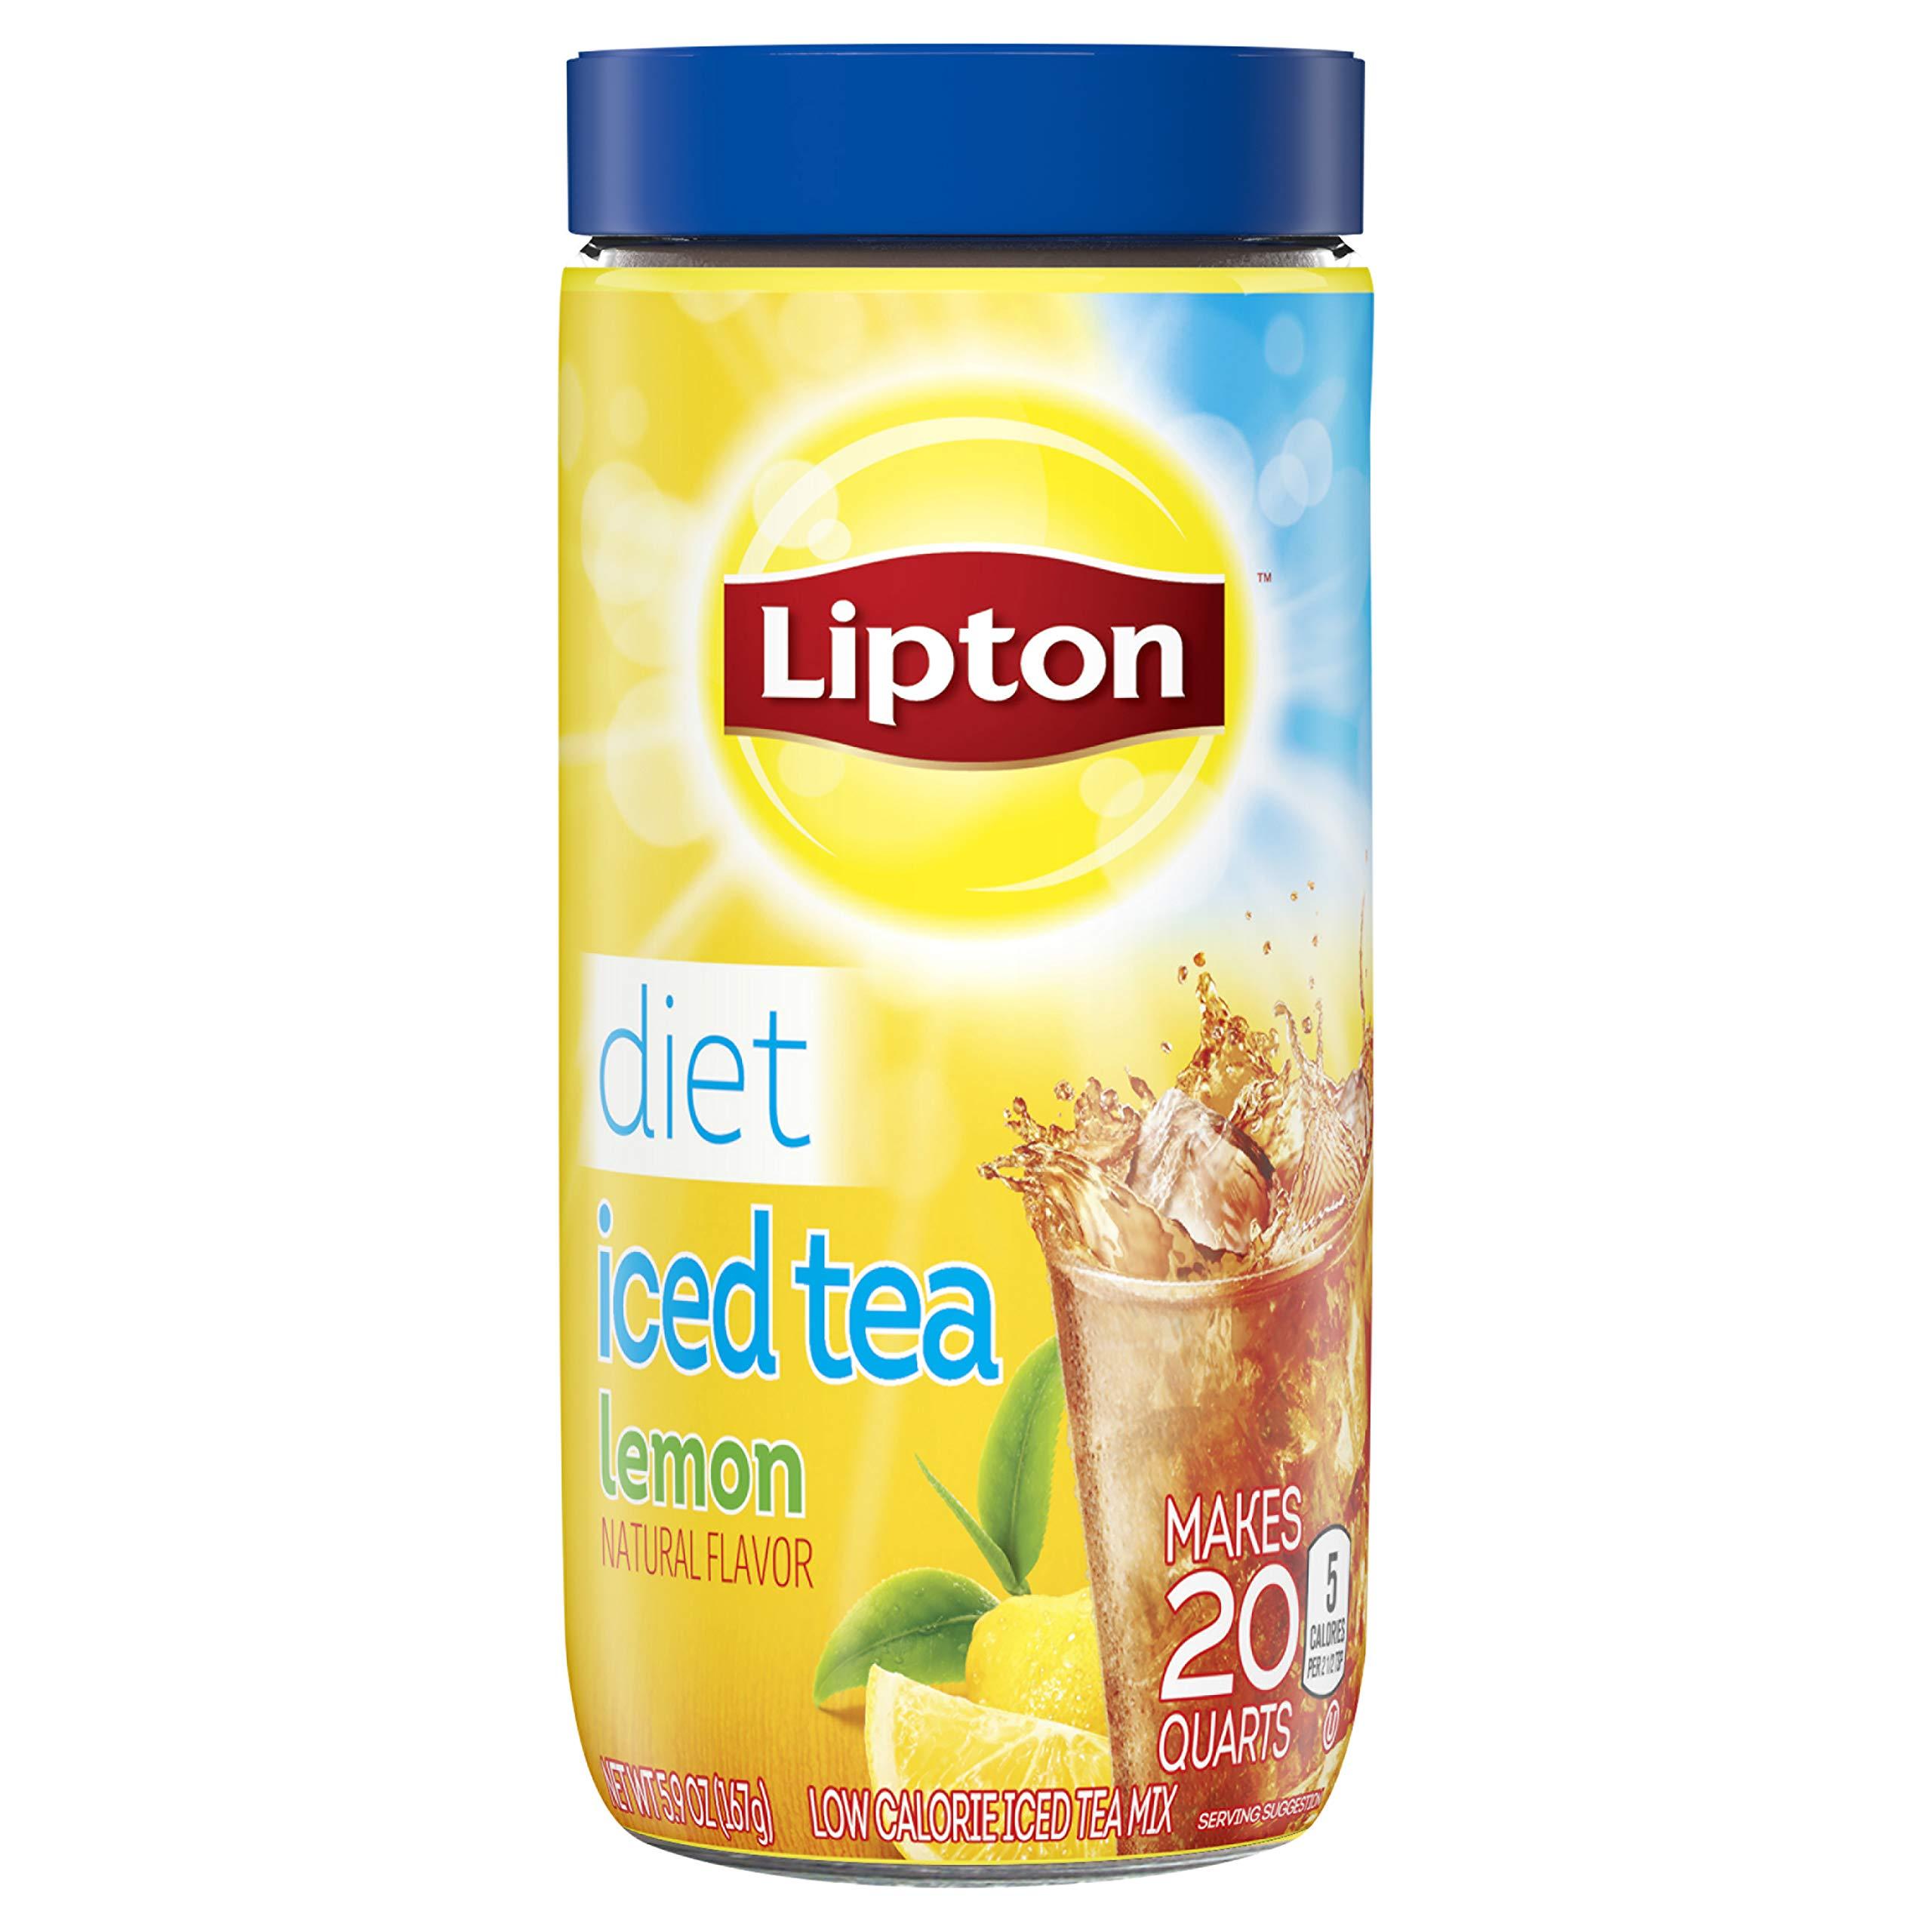 Lipton Black Iced Tea Mix, Diet Lemon 20 qt, pack of 6 by Lipton